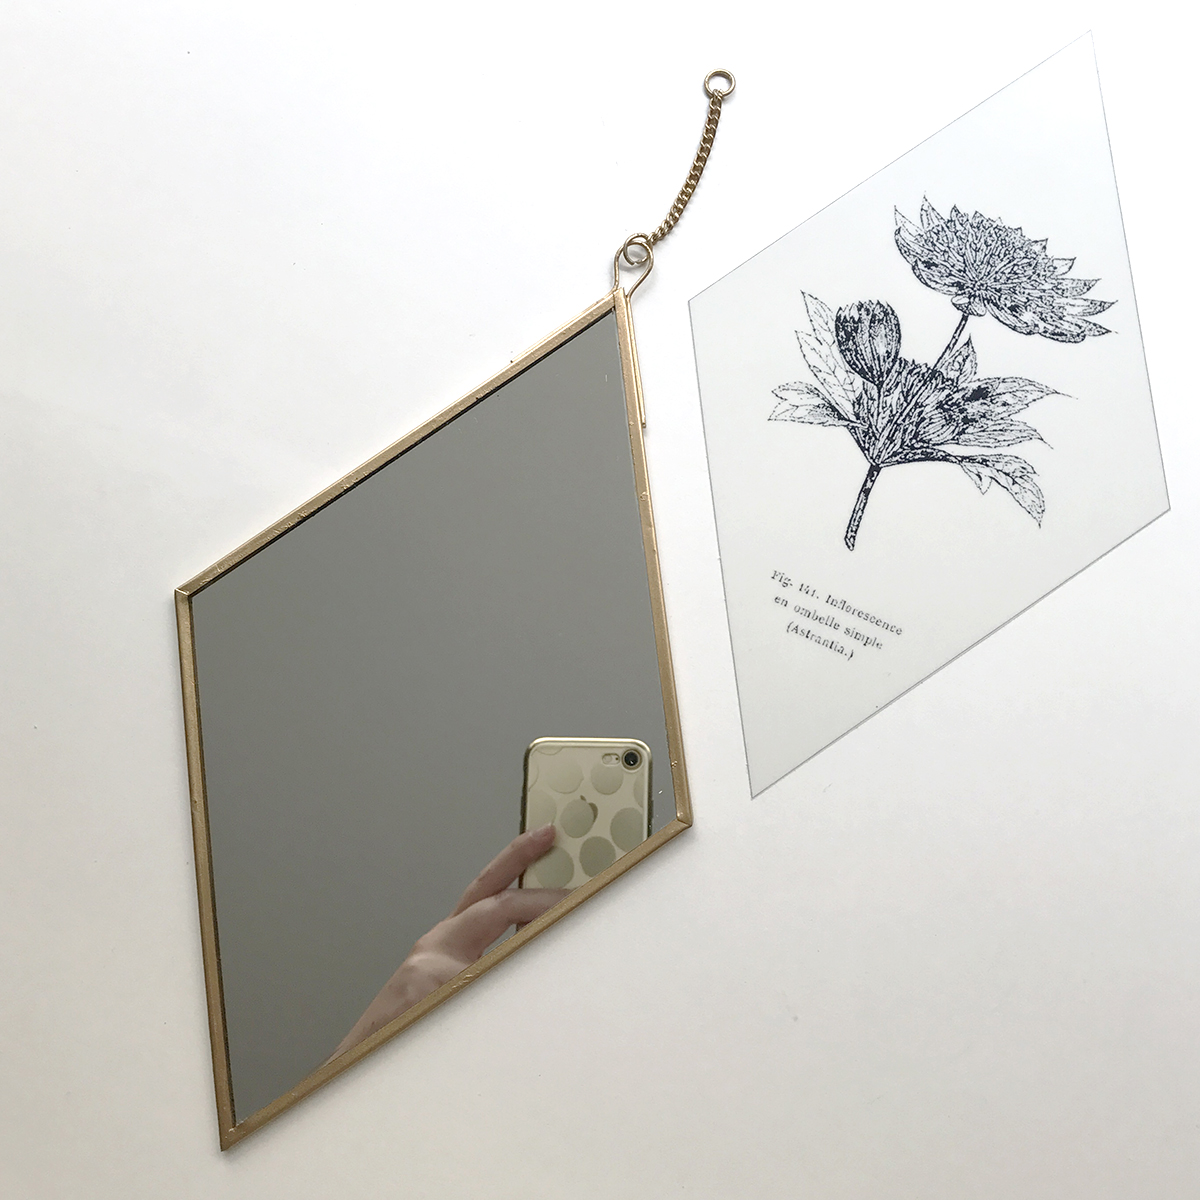 herbier-tendance-diy-gravure-miroir-1.jpg